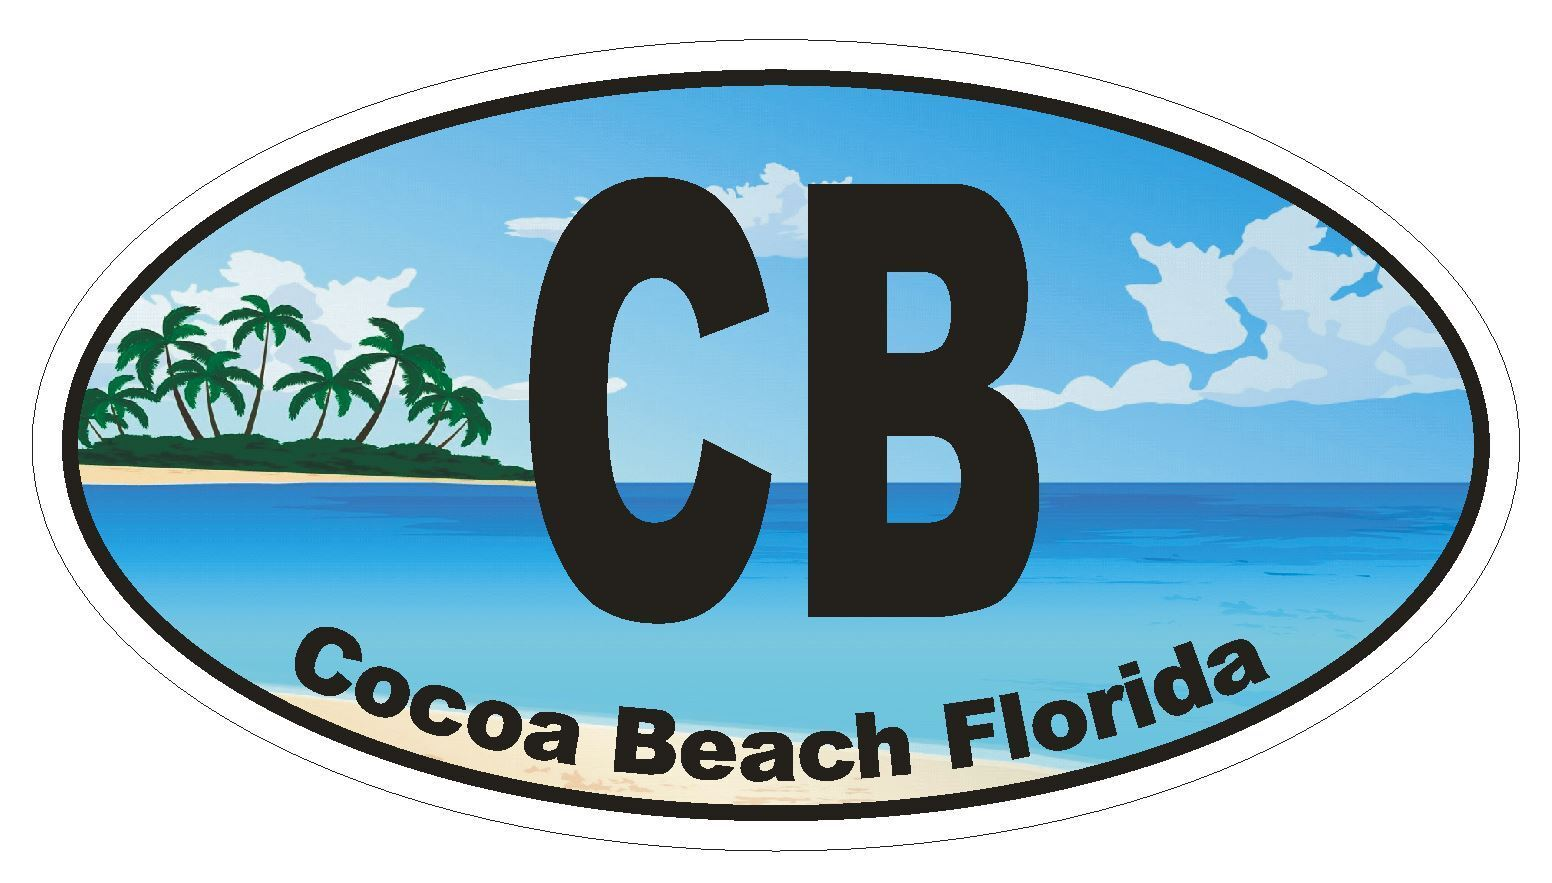 CB Cocoa Beach Florida Oval Bumper Sticker or Helmet Sticker D1123